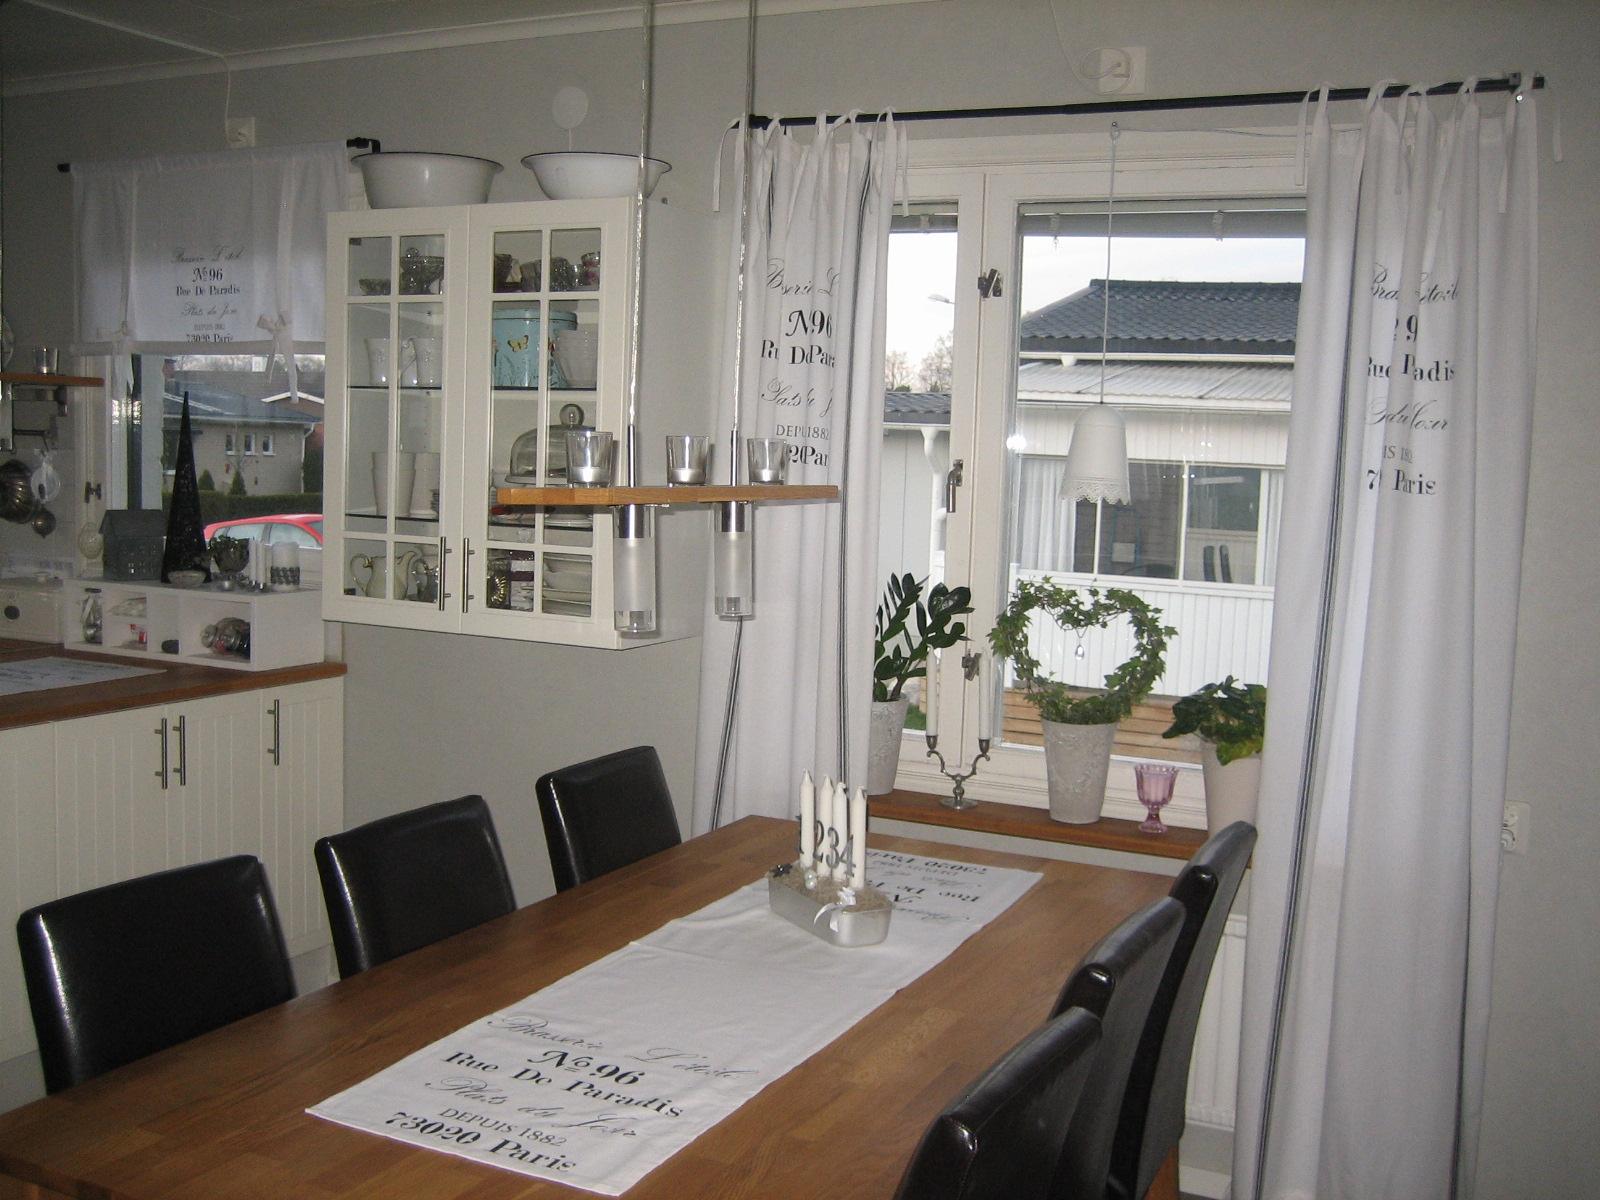 Vita huset 28: Nytt i köket